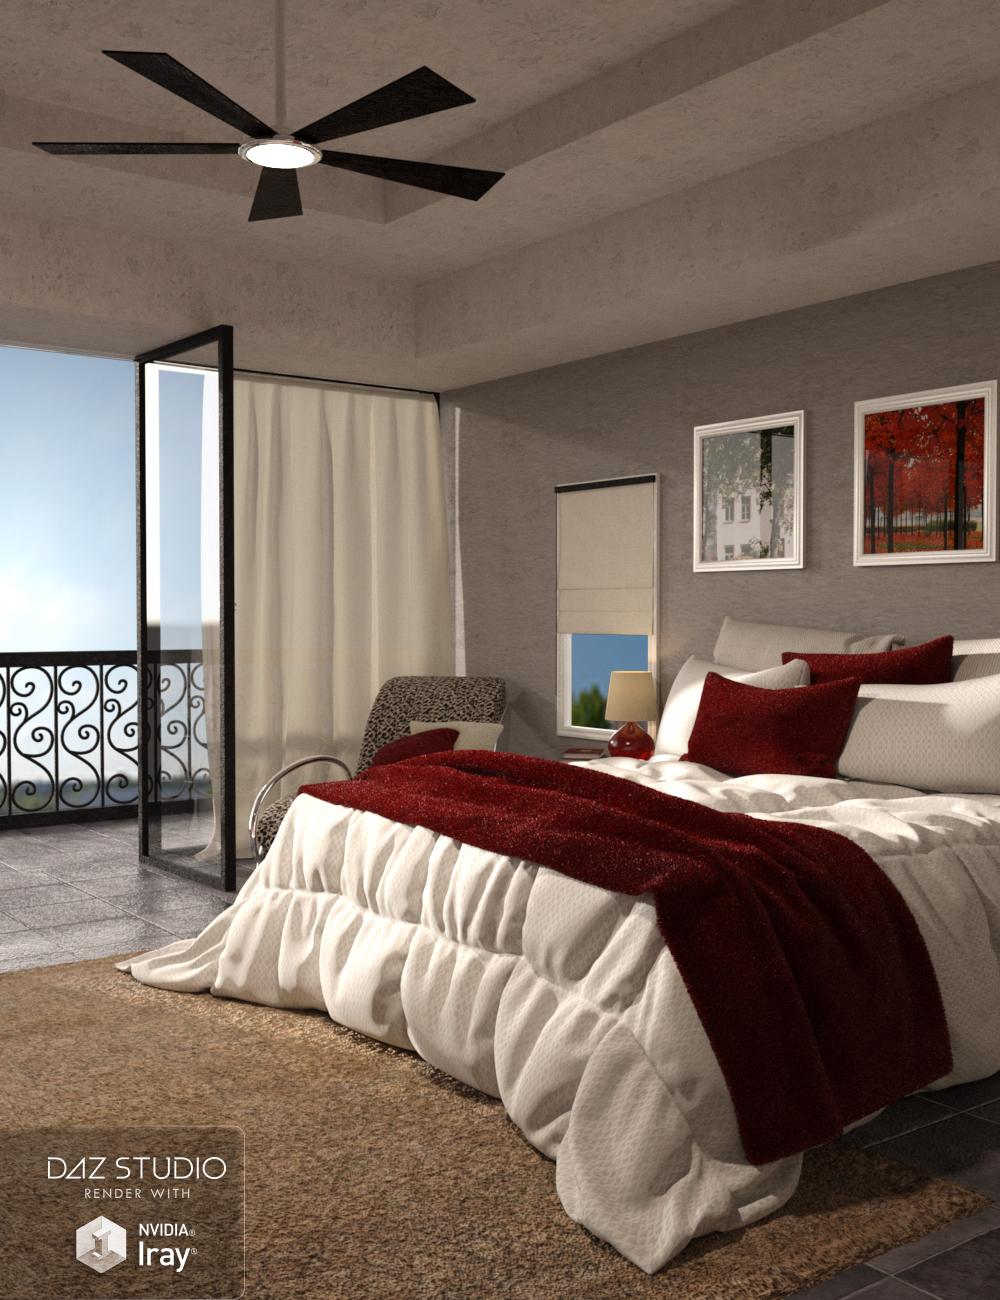 Classic Comfort Bedroom by: Nikisatez, 3D Models by Daz 3D